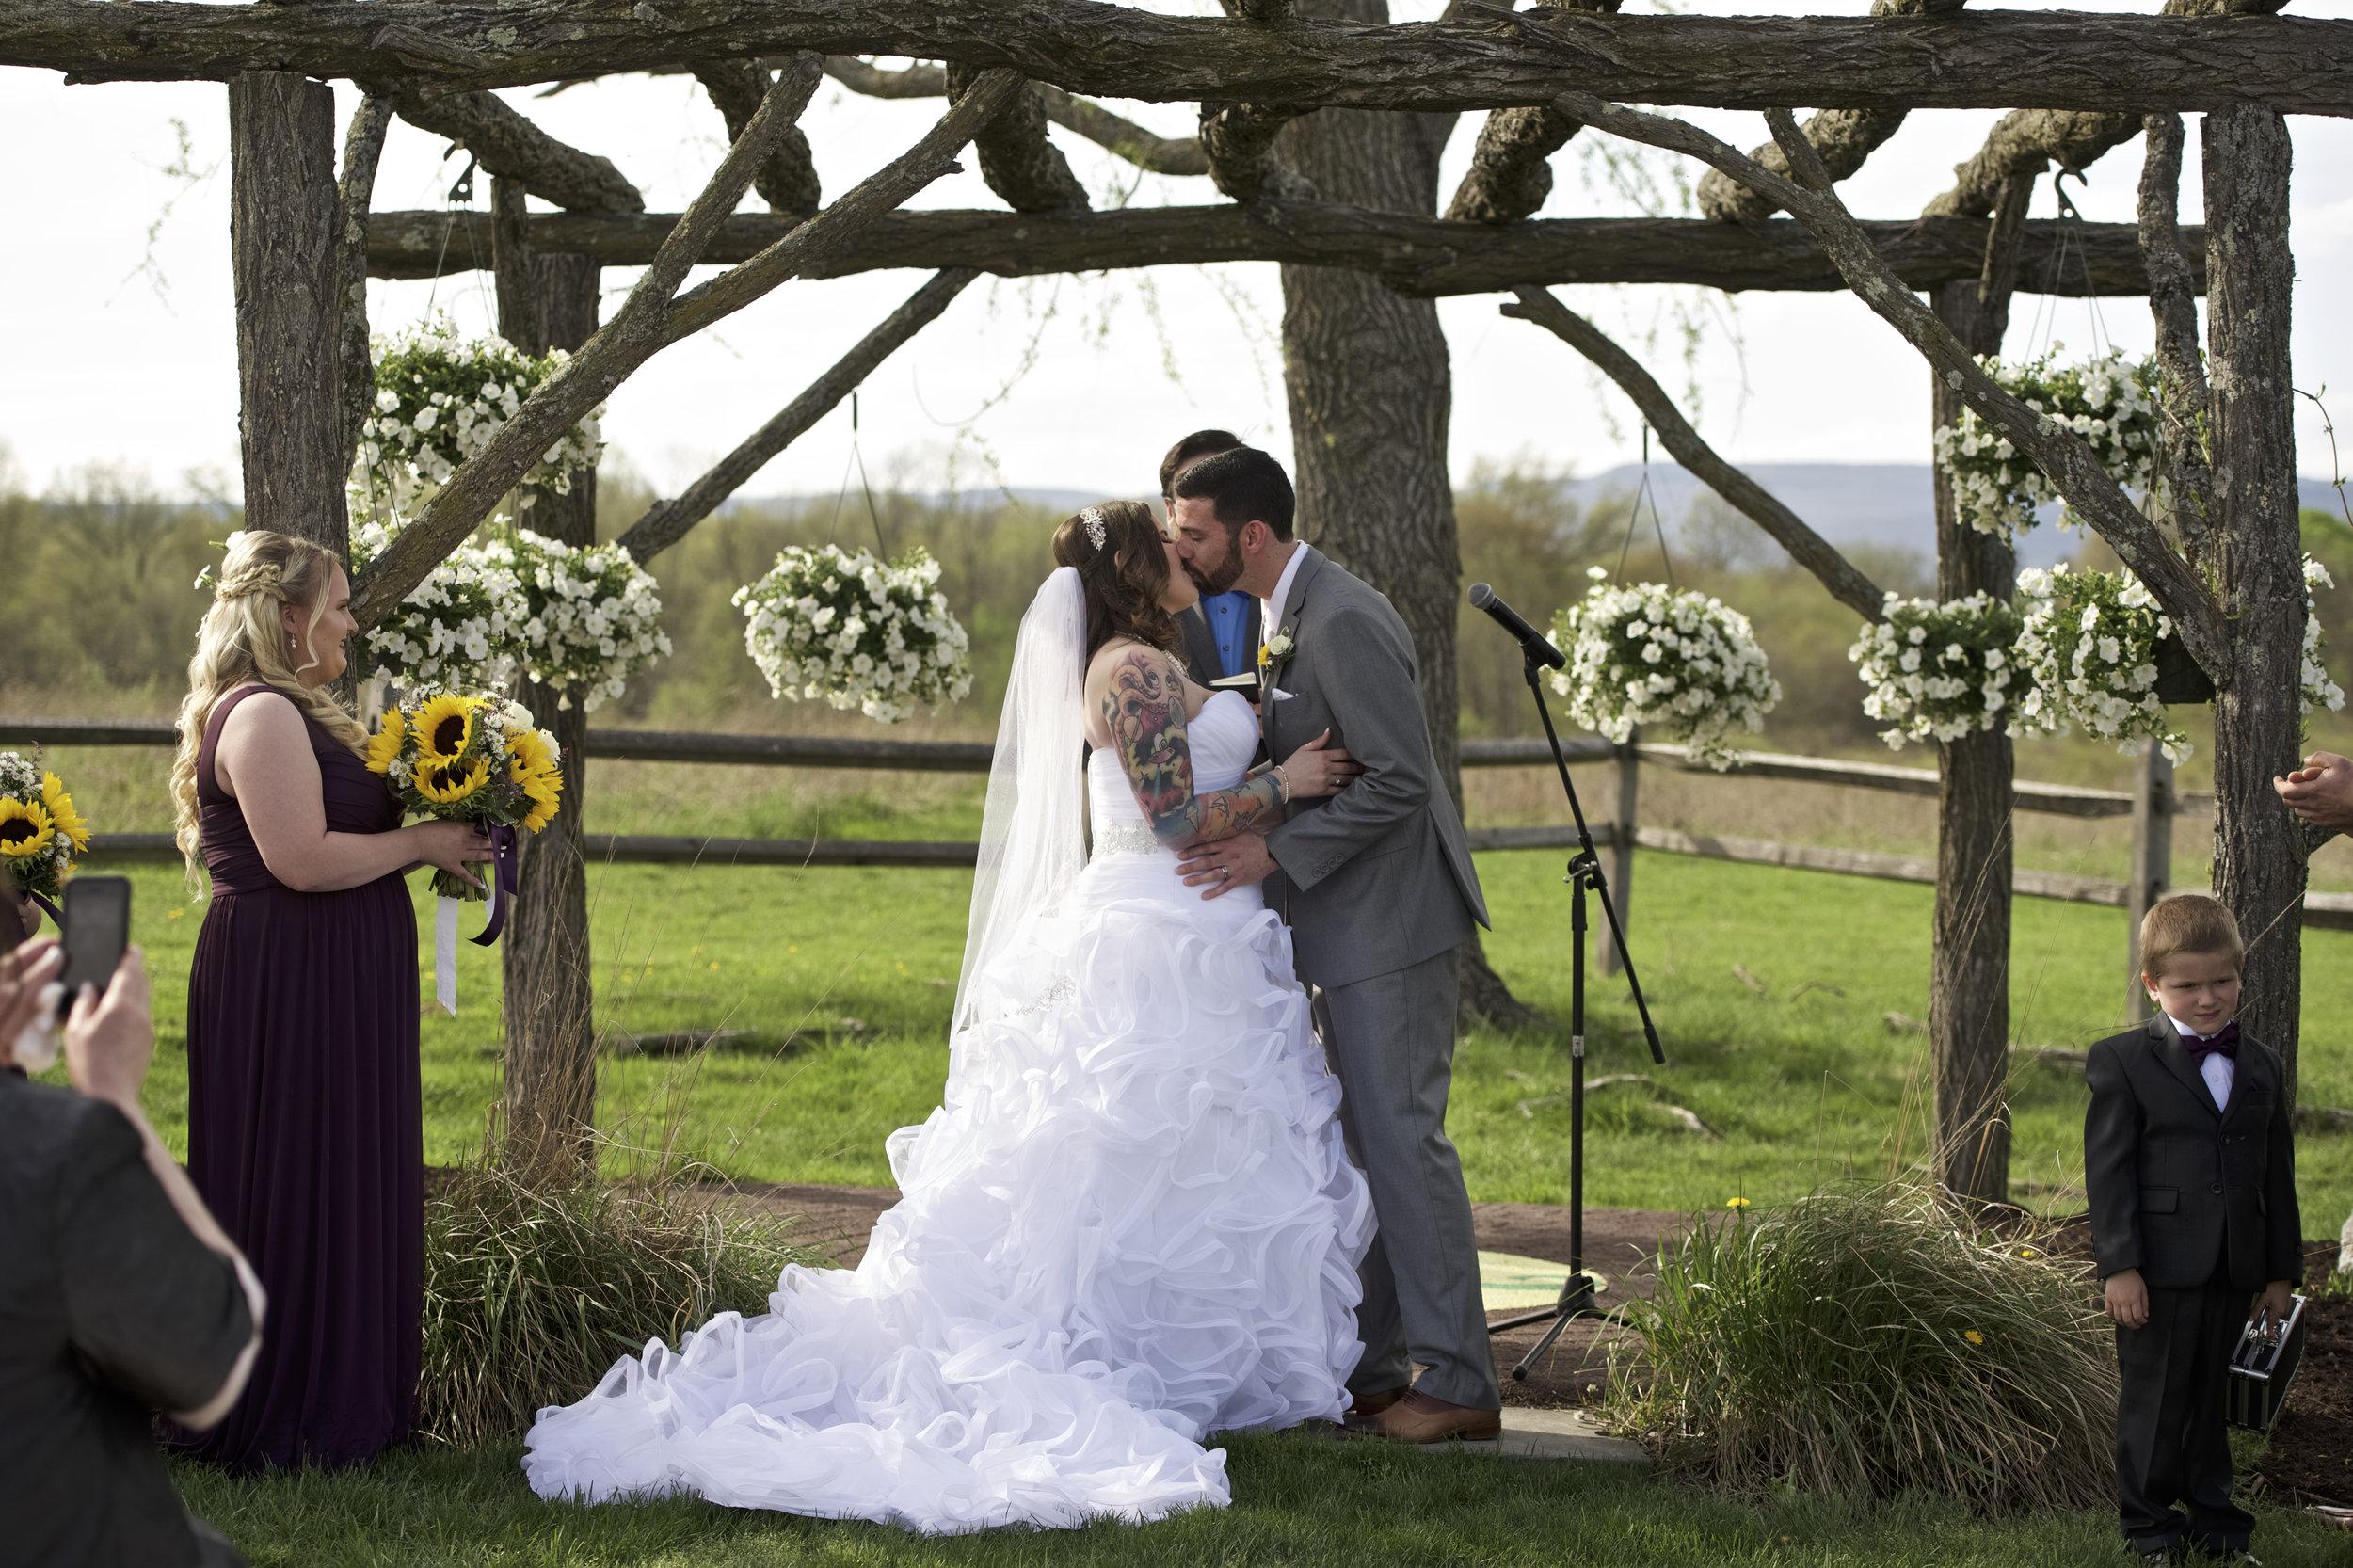 Lippincott manor wedding, wallkill ny wedding, photography, photos l.jpg